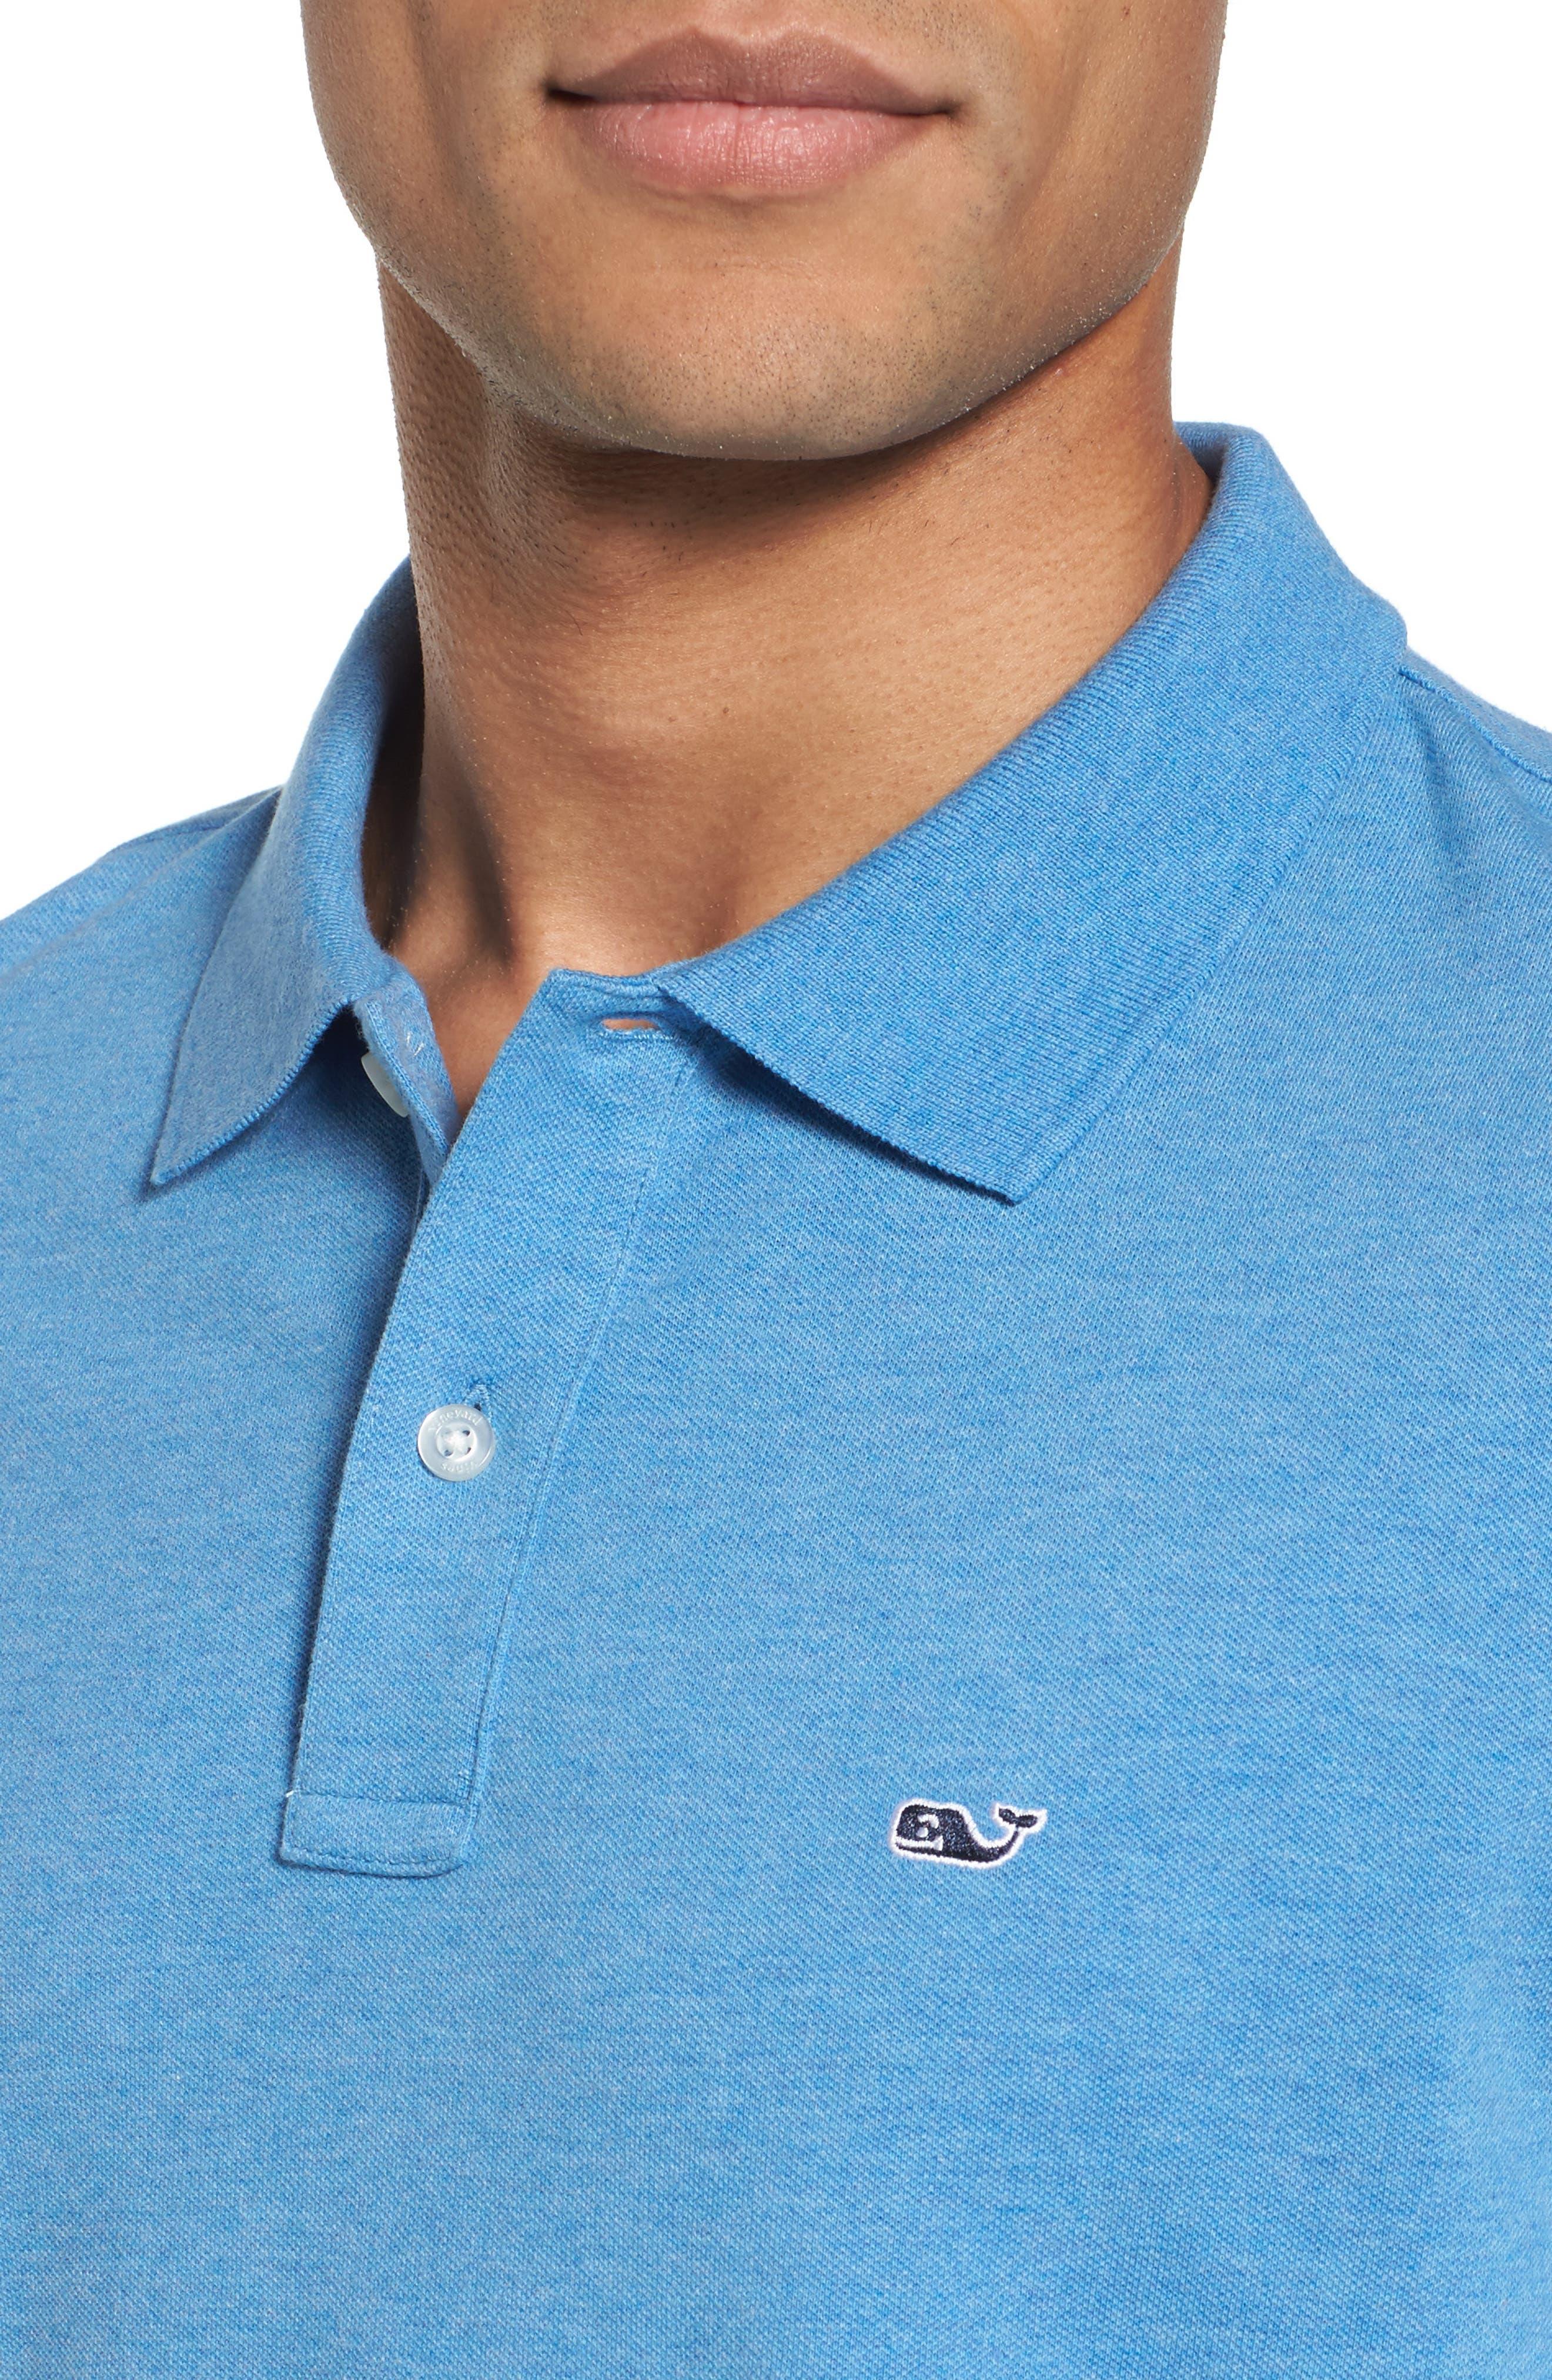 Regular Fit Piqué Polo,                             Alternate thumbnail 4, color,                             DOCKSIDE BLUE